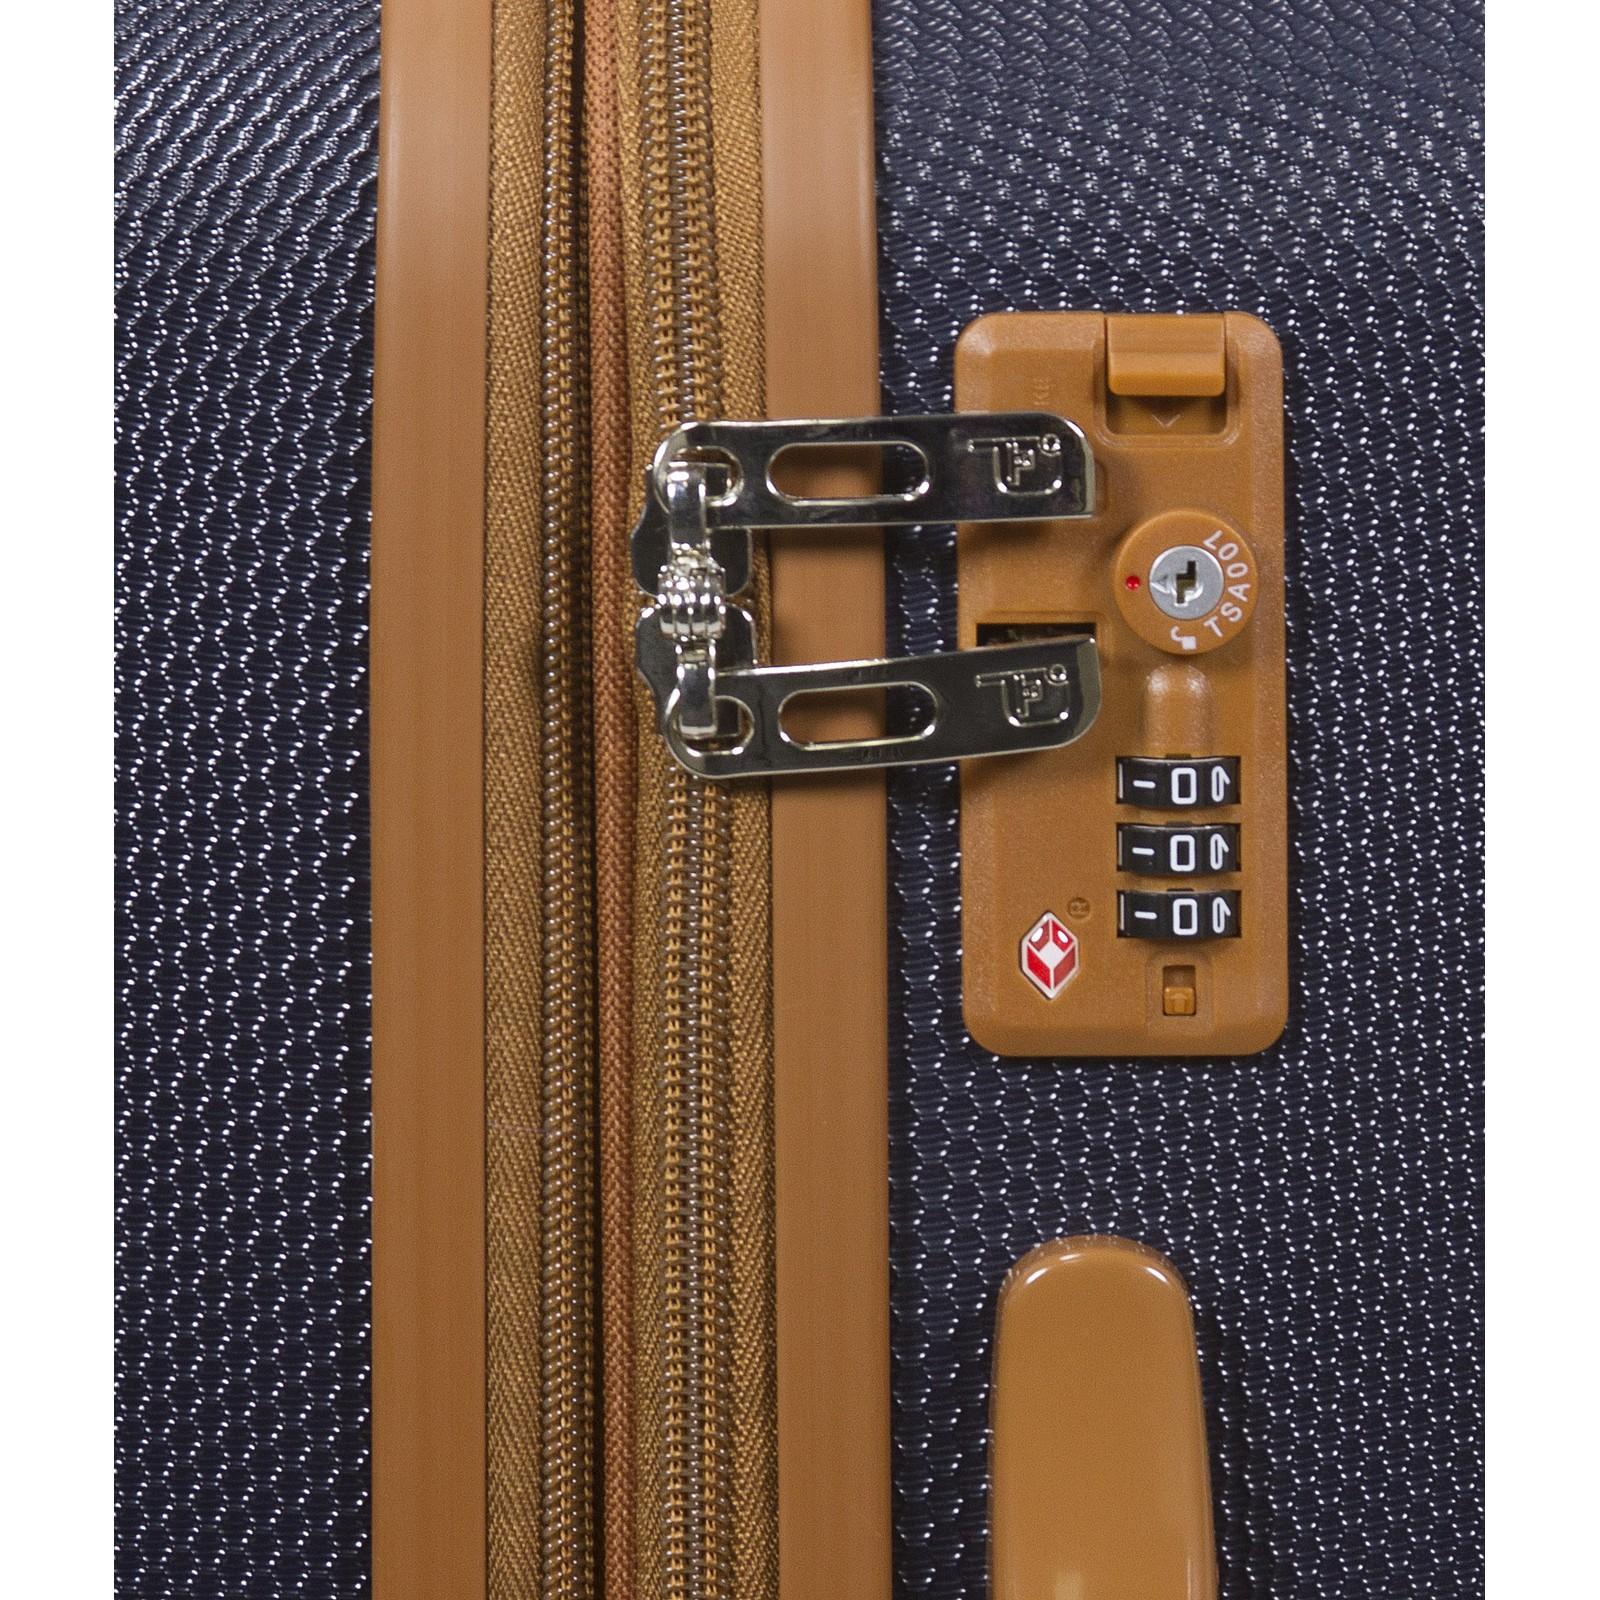 Dejuno-Legion-3-PC-Hardside-Spinner-TSA-Combination-Lock-Luggage-Set